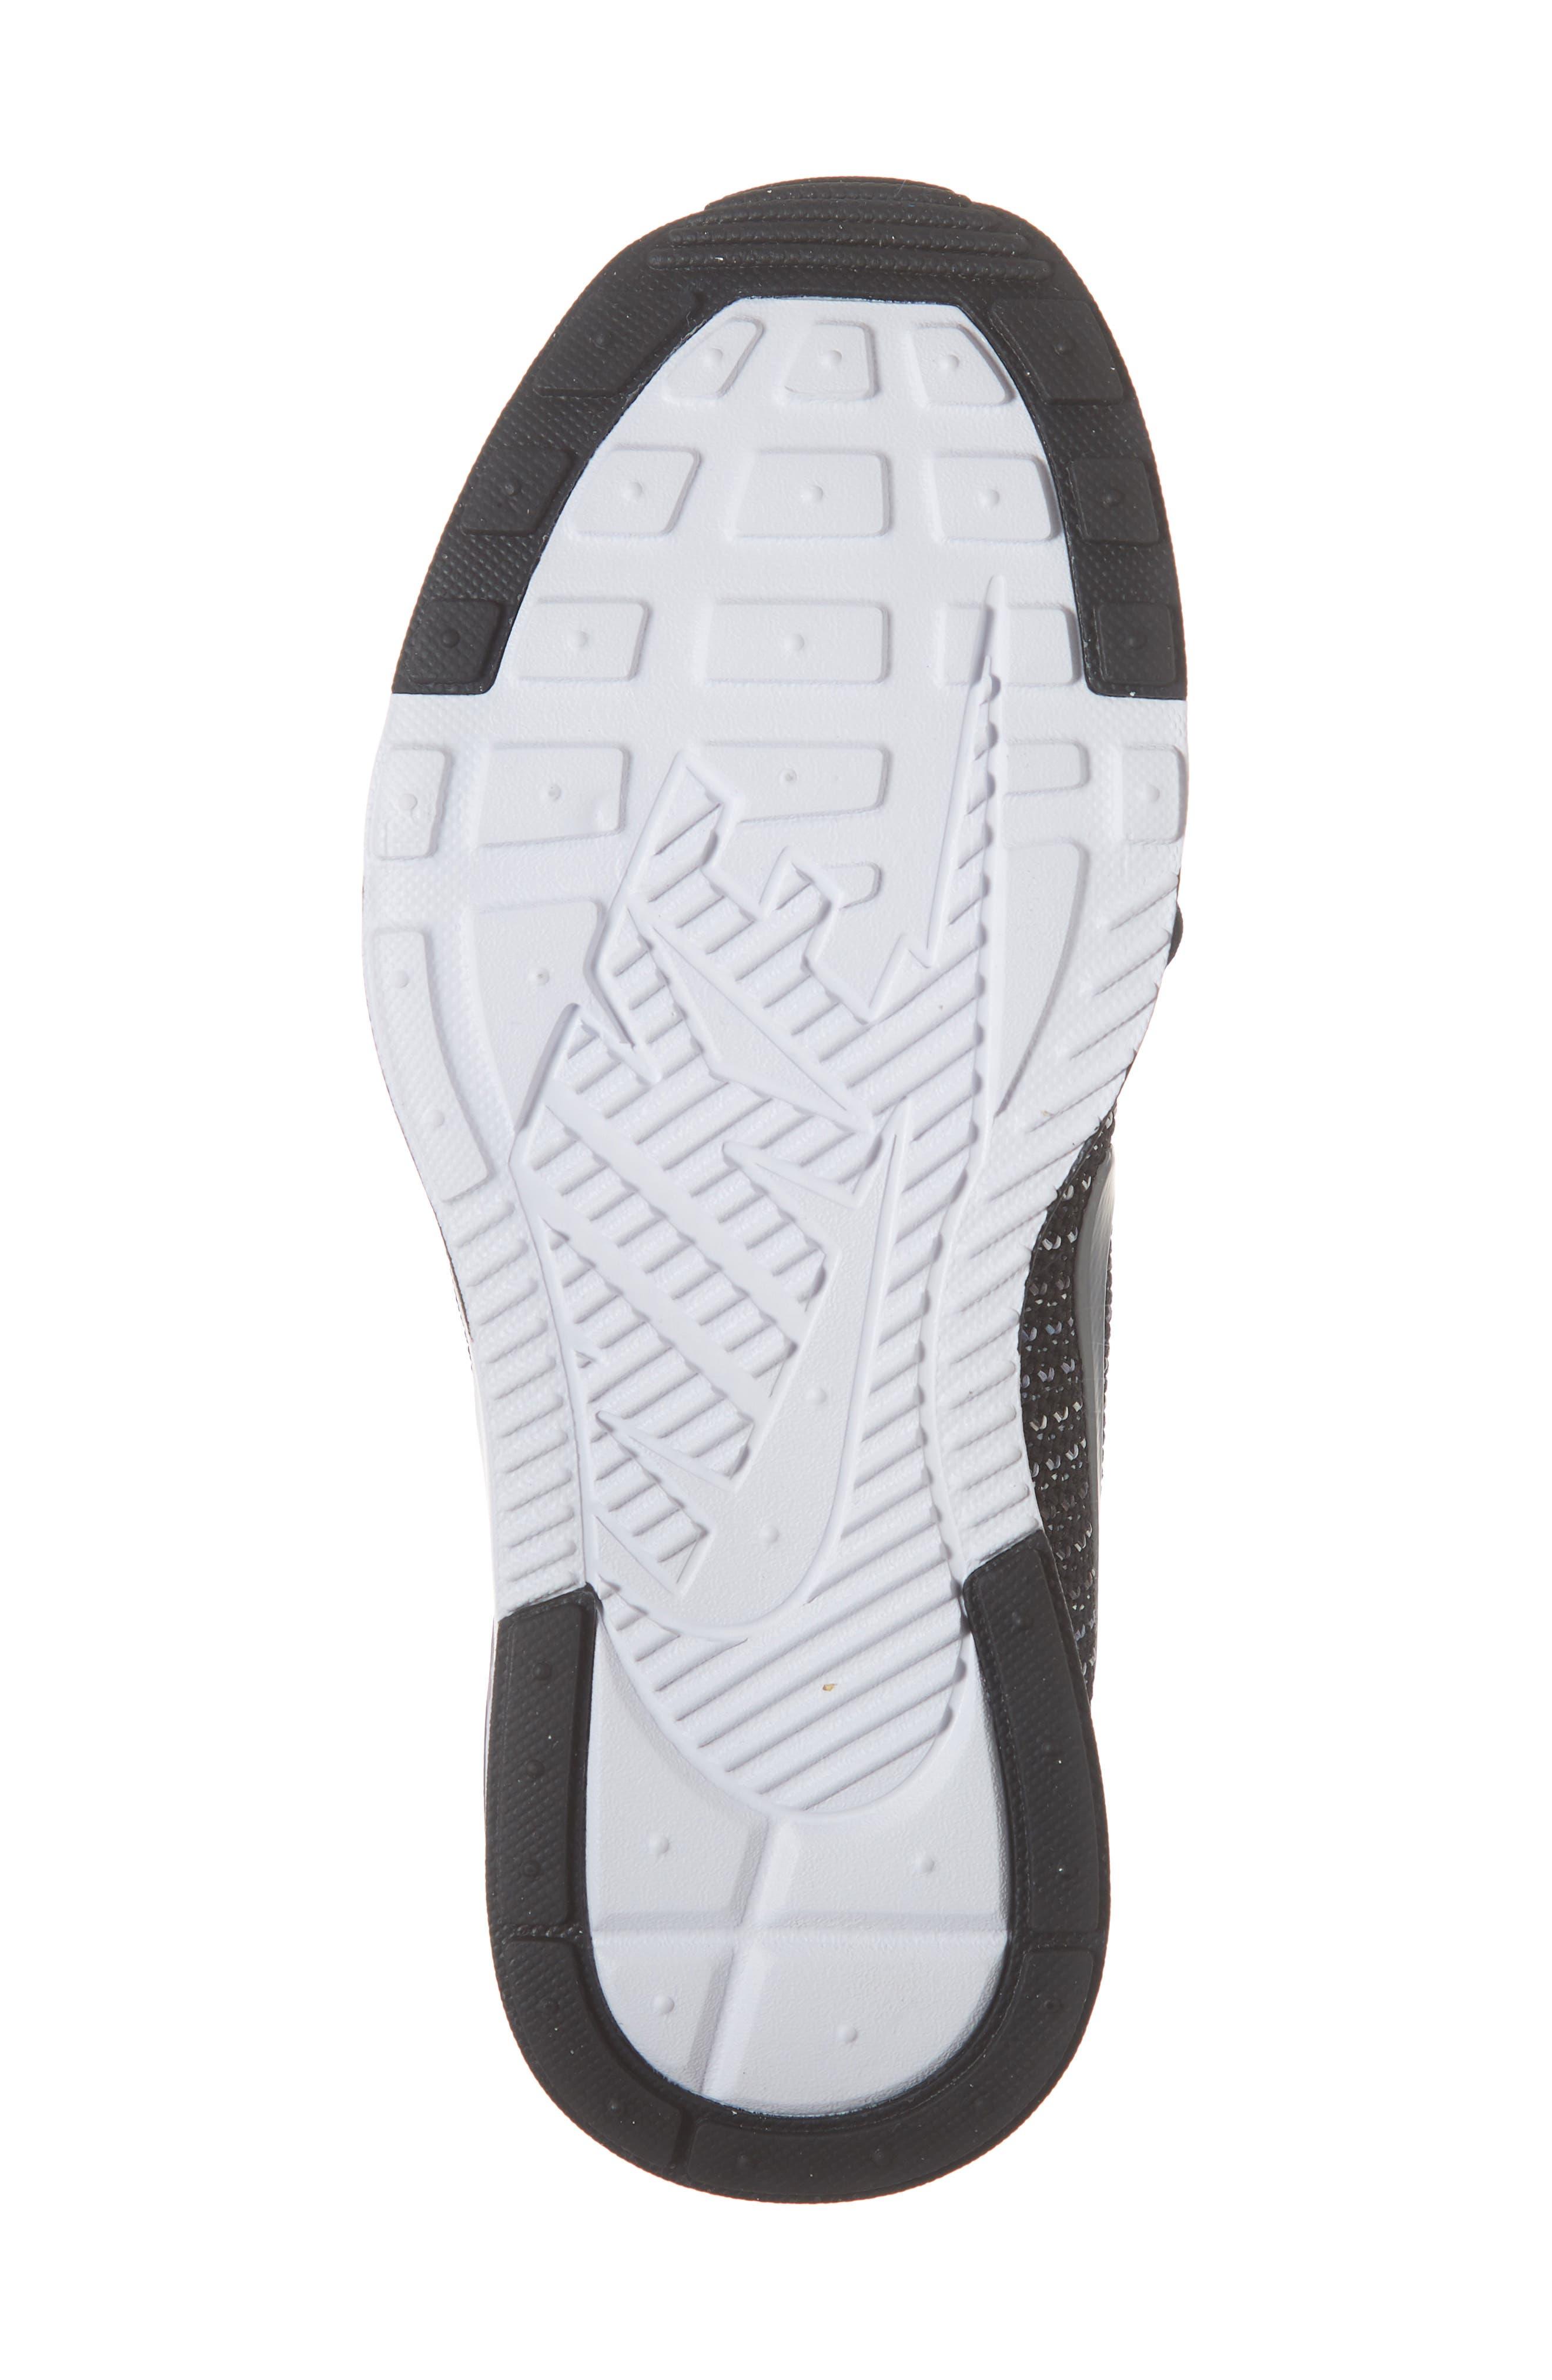 Ashin Modern Sock Knit Sneaker,                             Alternate thumbnail 5, color,                             Black/ Cool Grey/ Anthracite